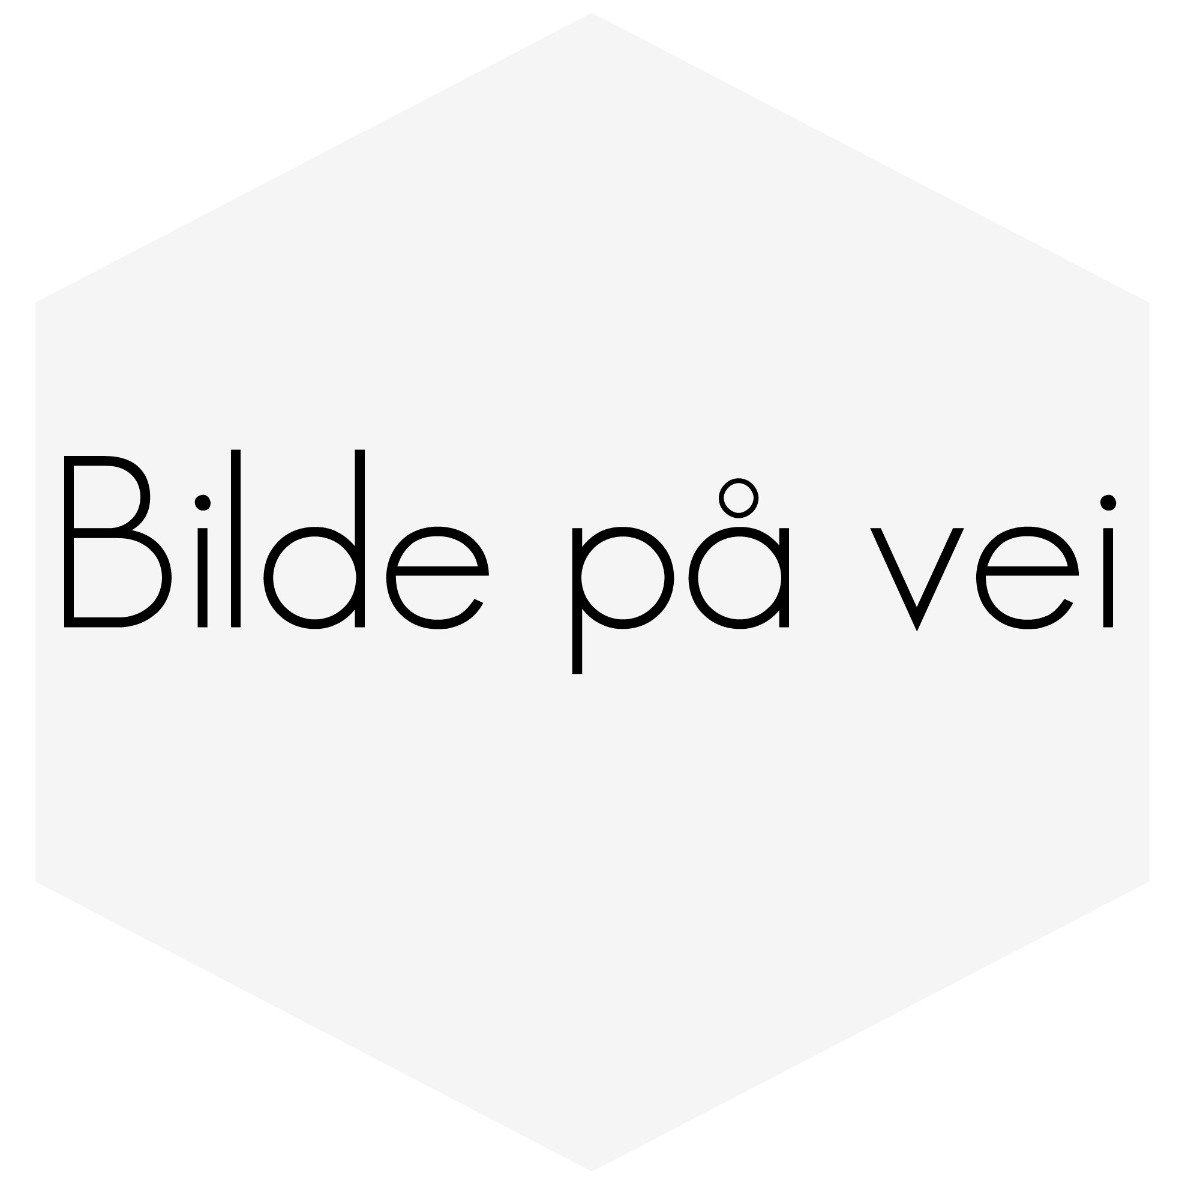 HOVEDLAMPE VOLVO V50 04-7MND 07 30698886 HØYRE